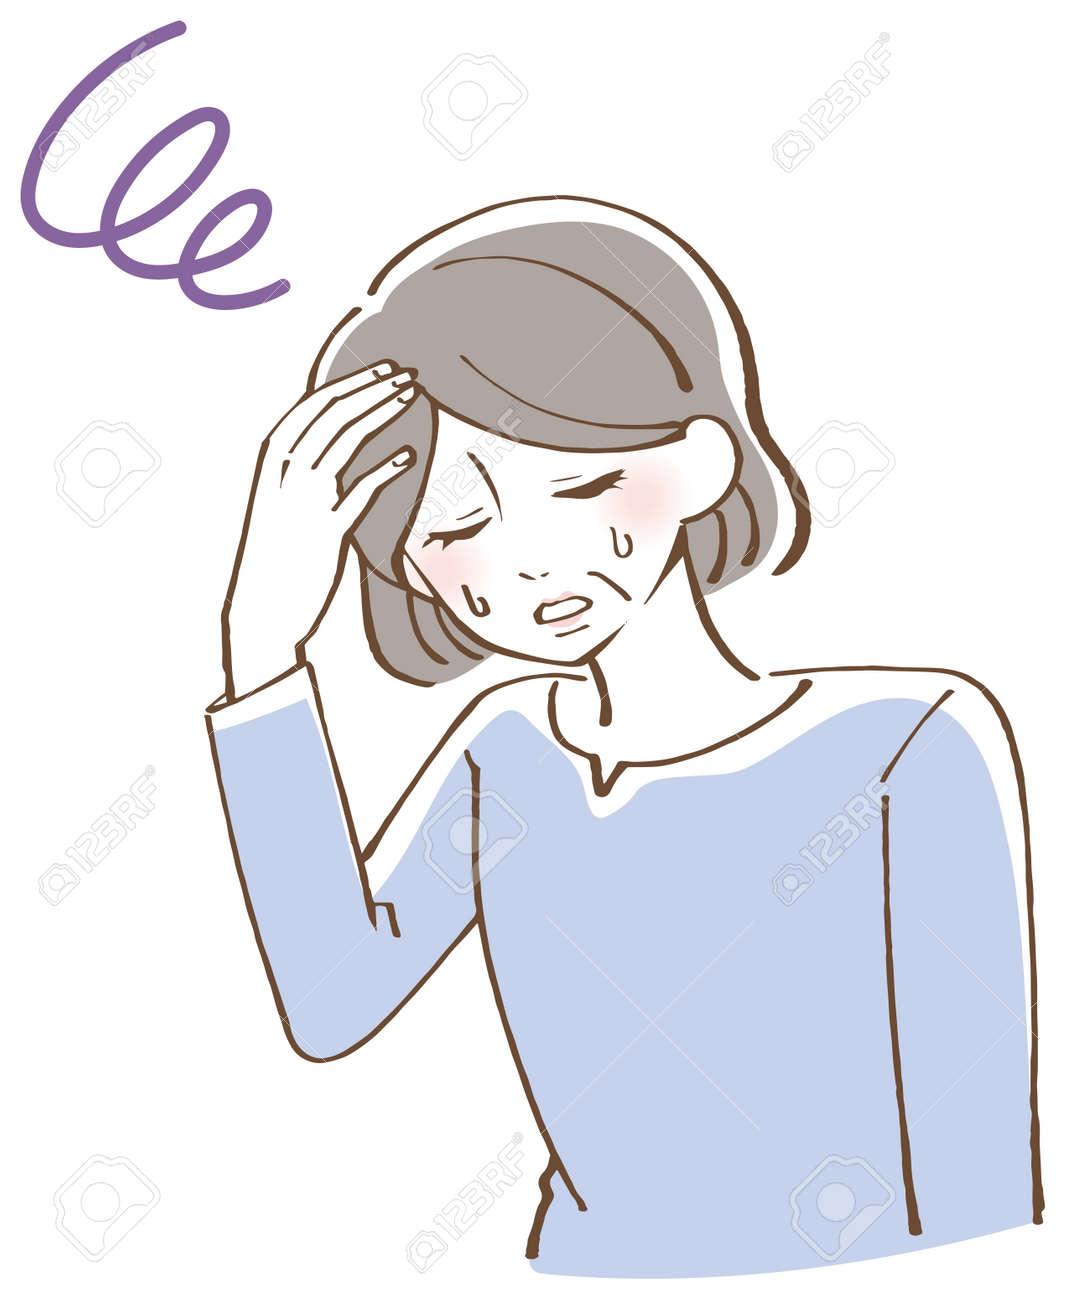 Anemia dizziness senior female illustration - 165227255